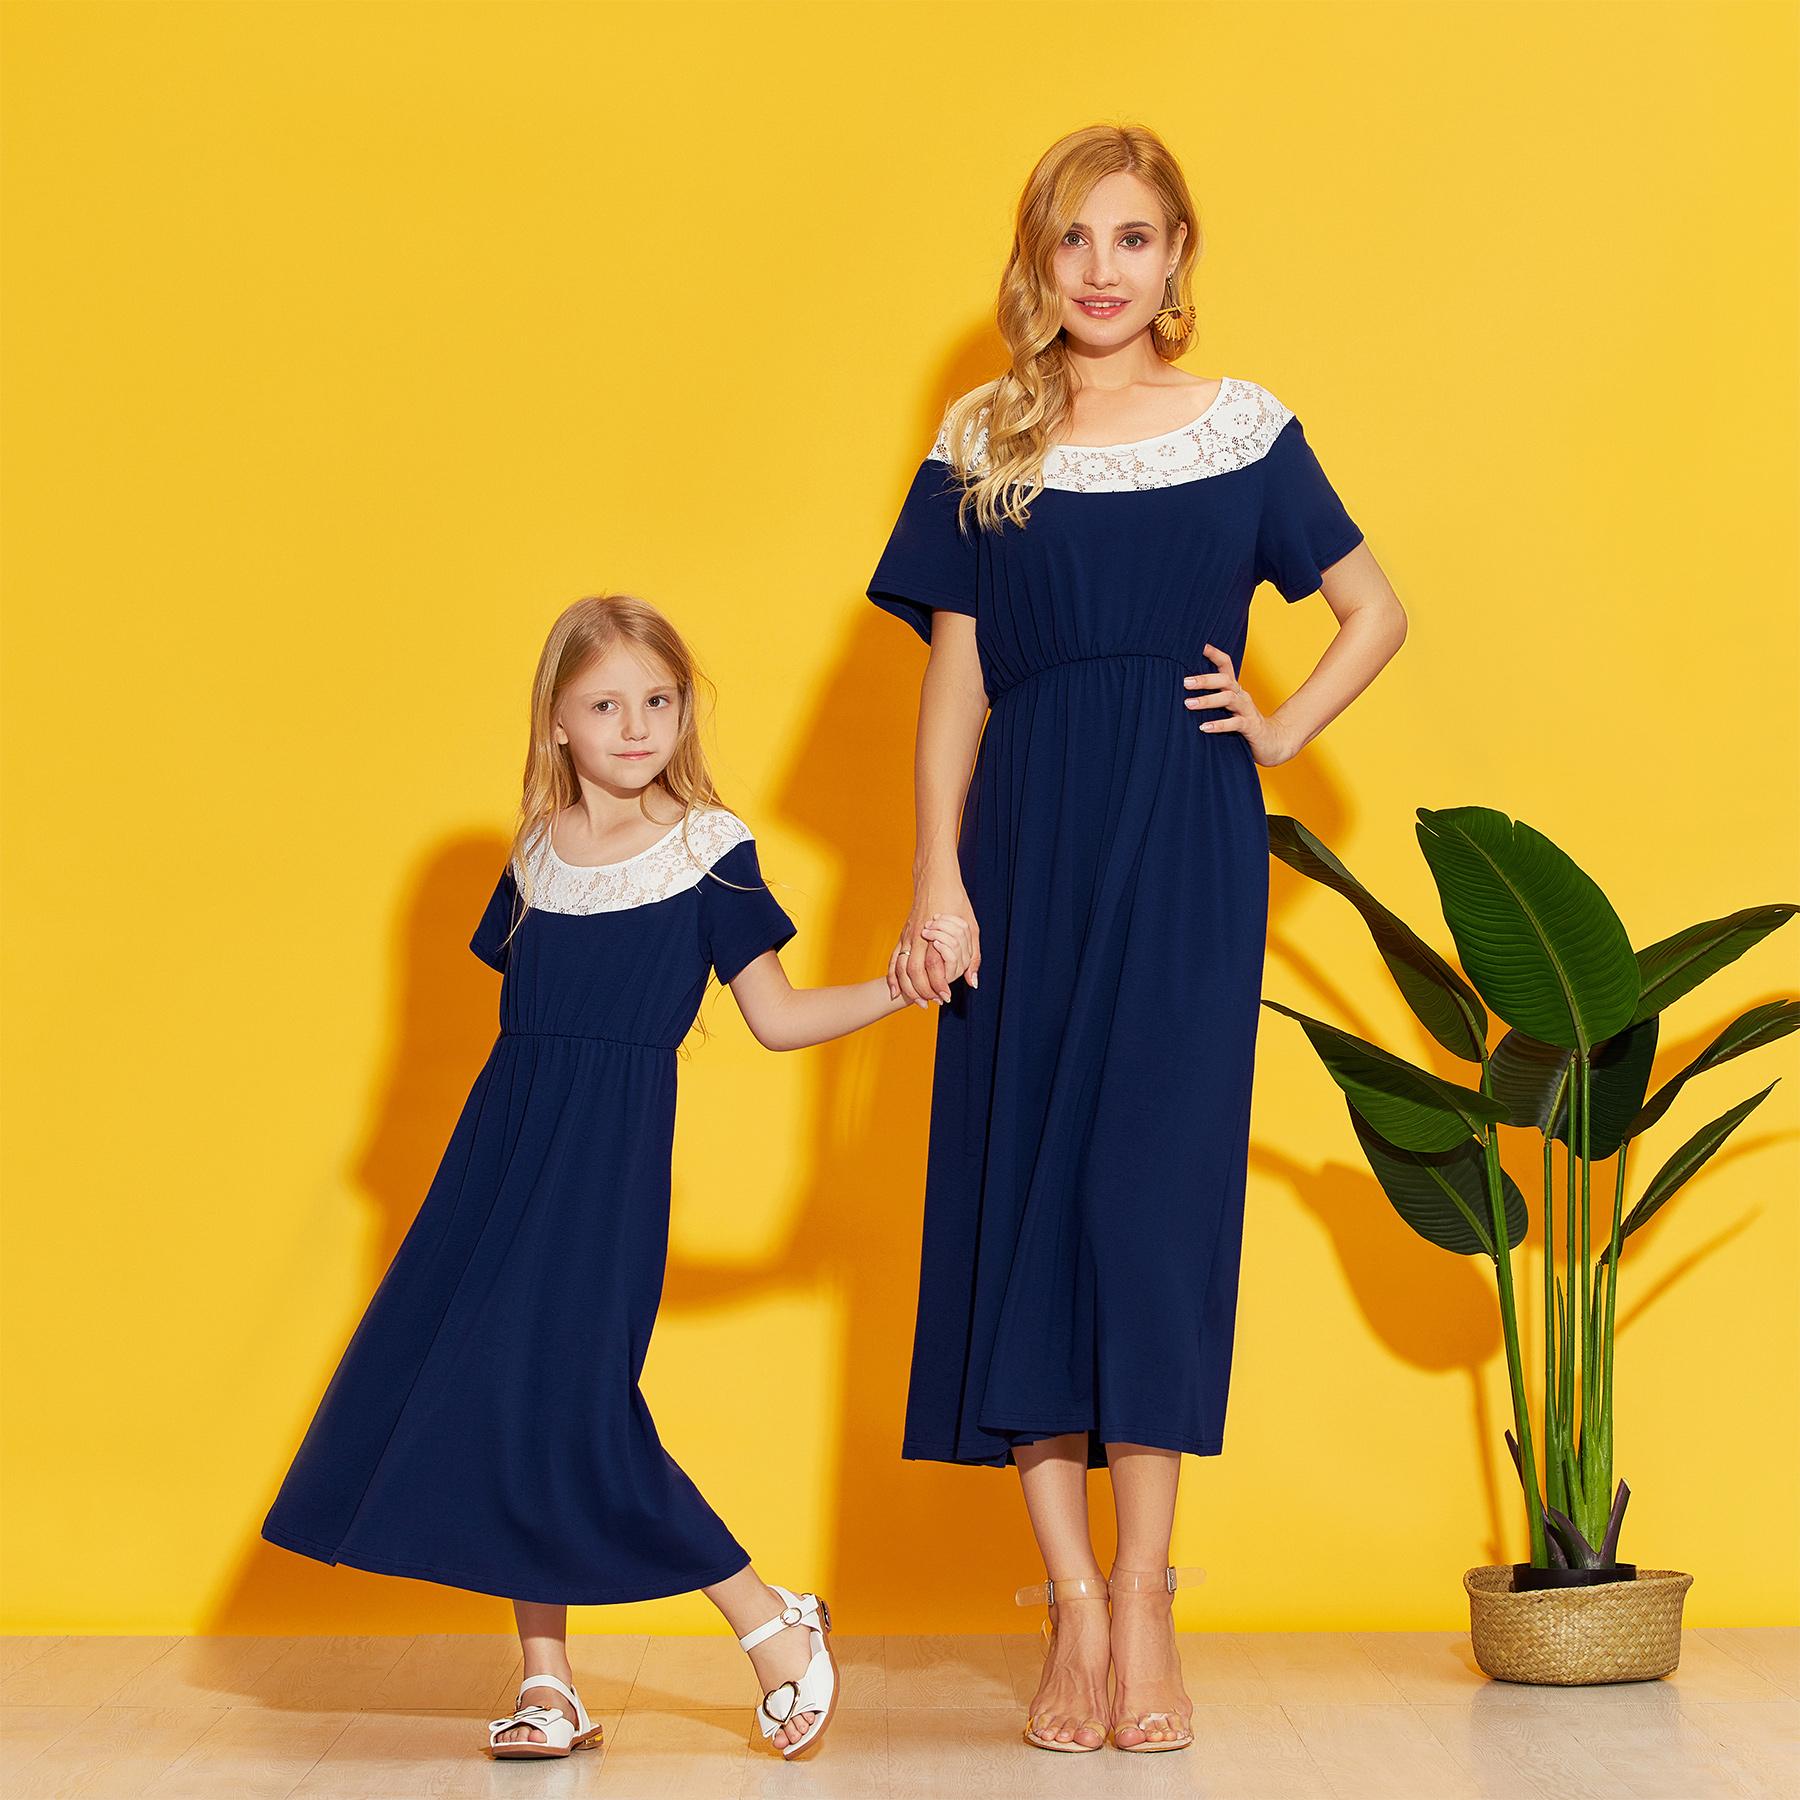 Solid Stitching Lace Matching Dresses